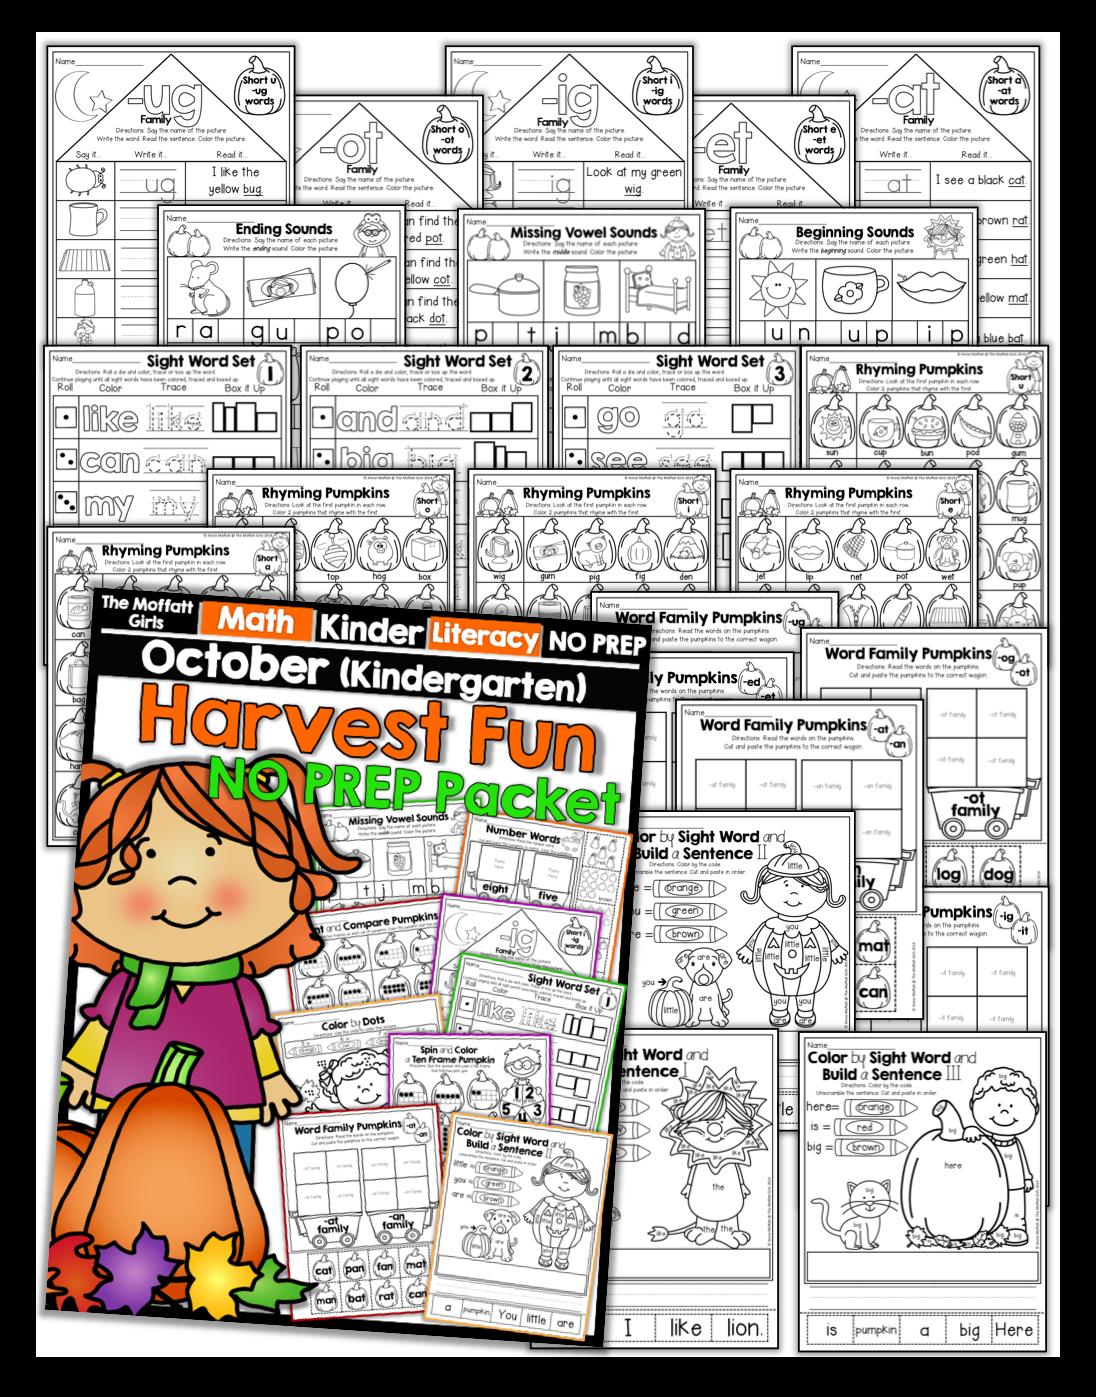 October No Prep Packets For Kindergarten Tons Of Hands On